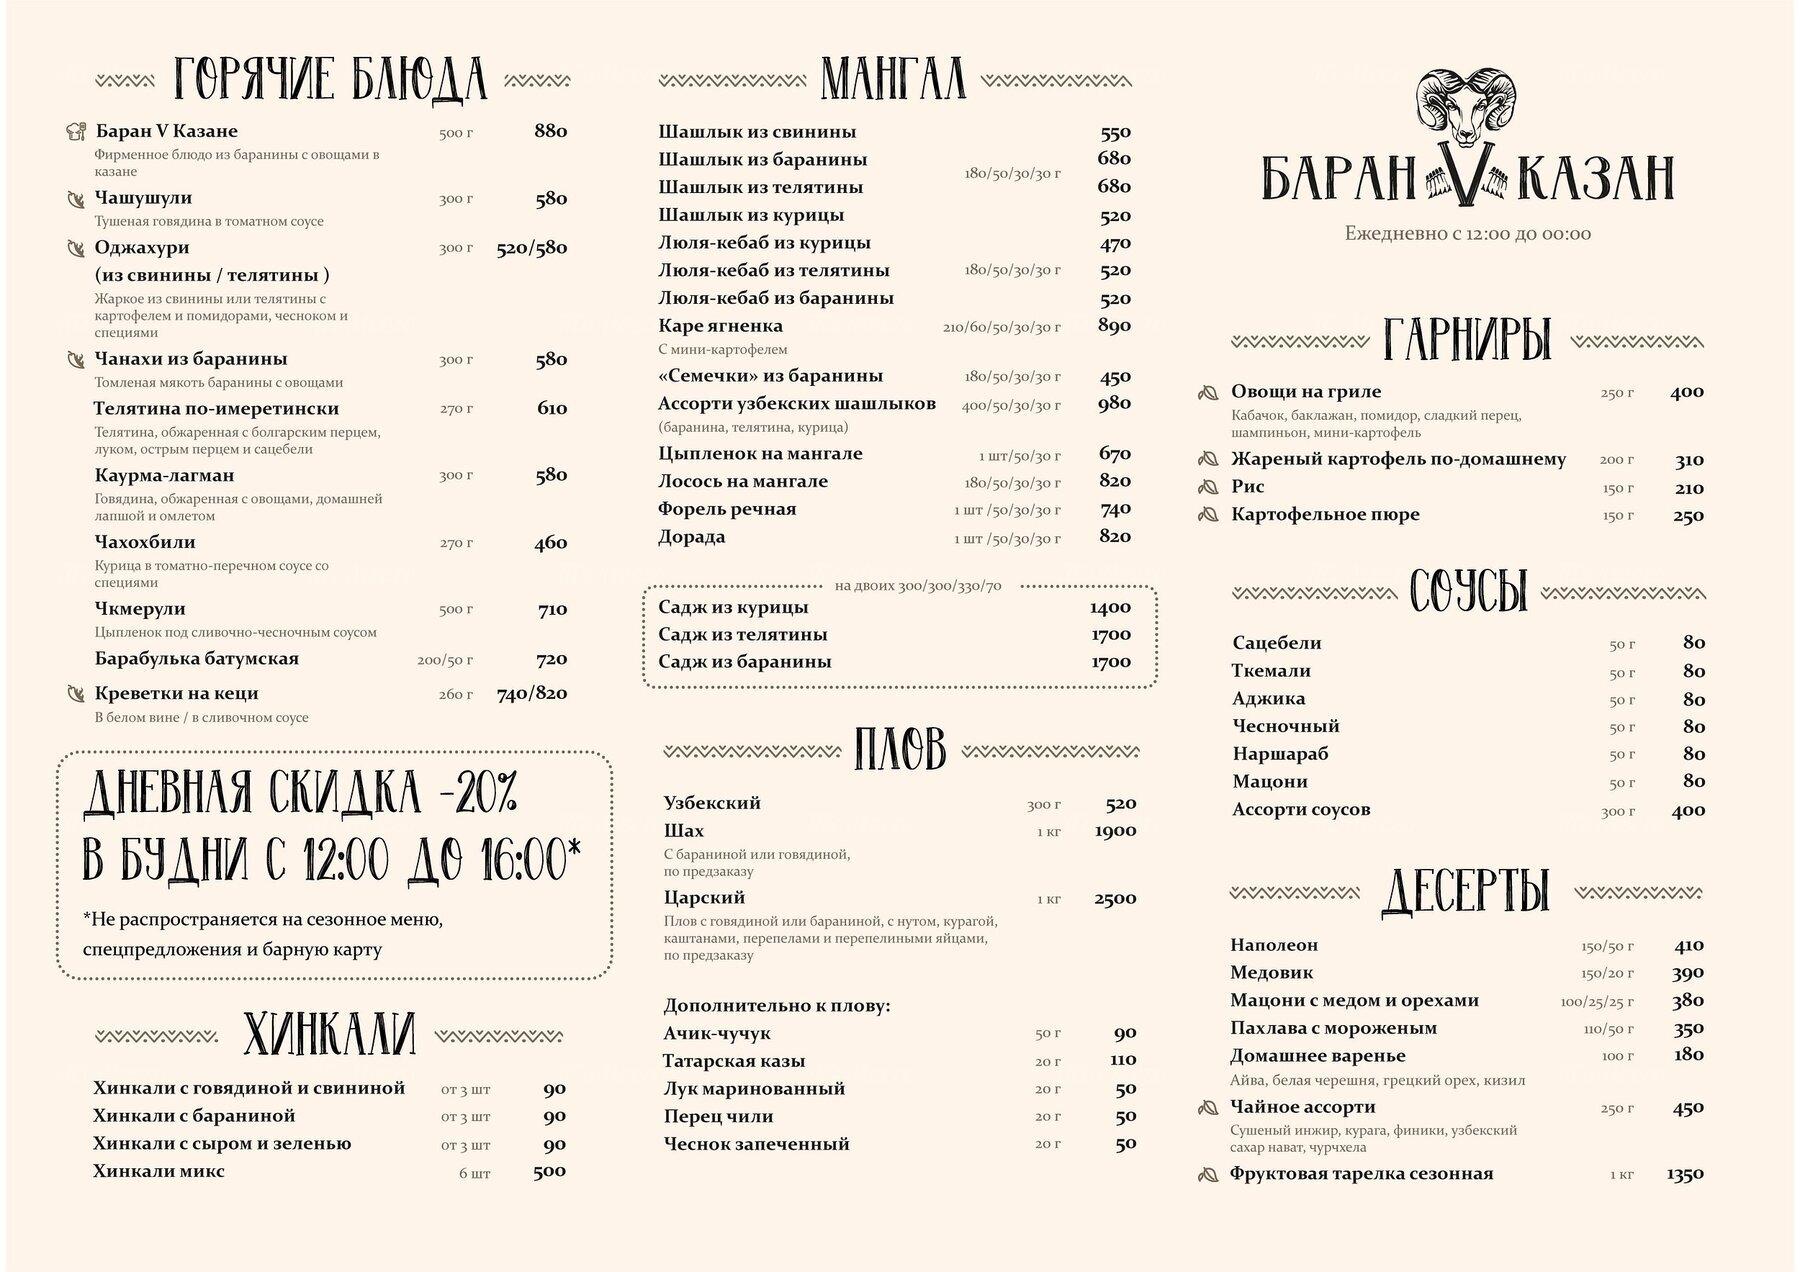 Меню ресторана Баран в Казан на Марксистской фото 2